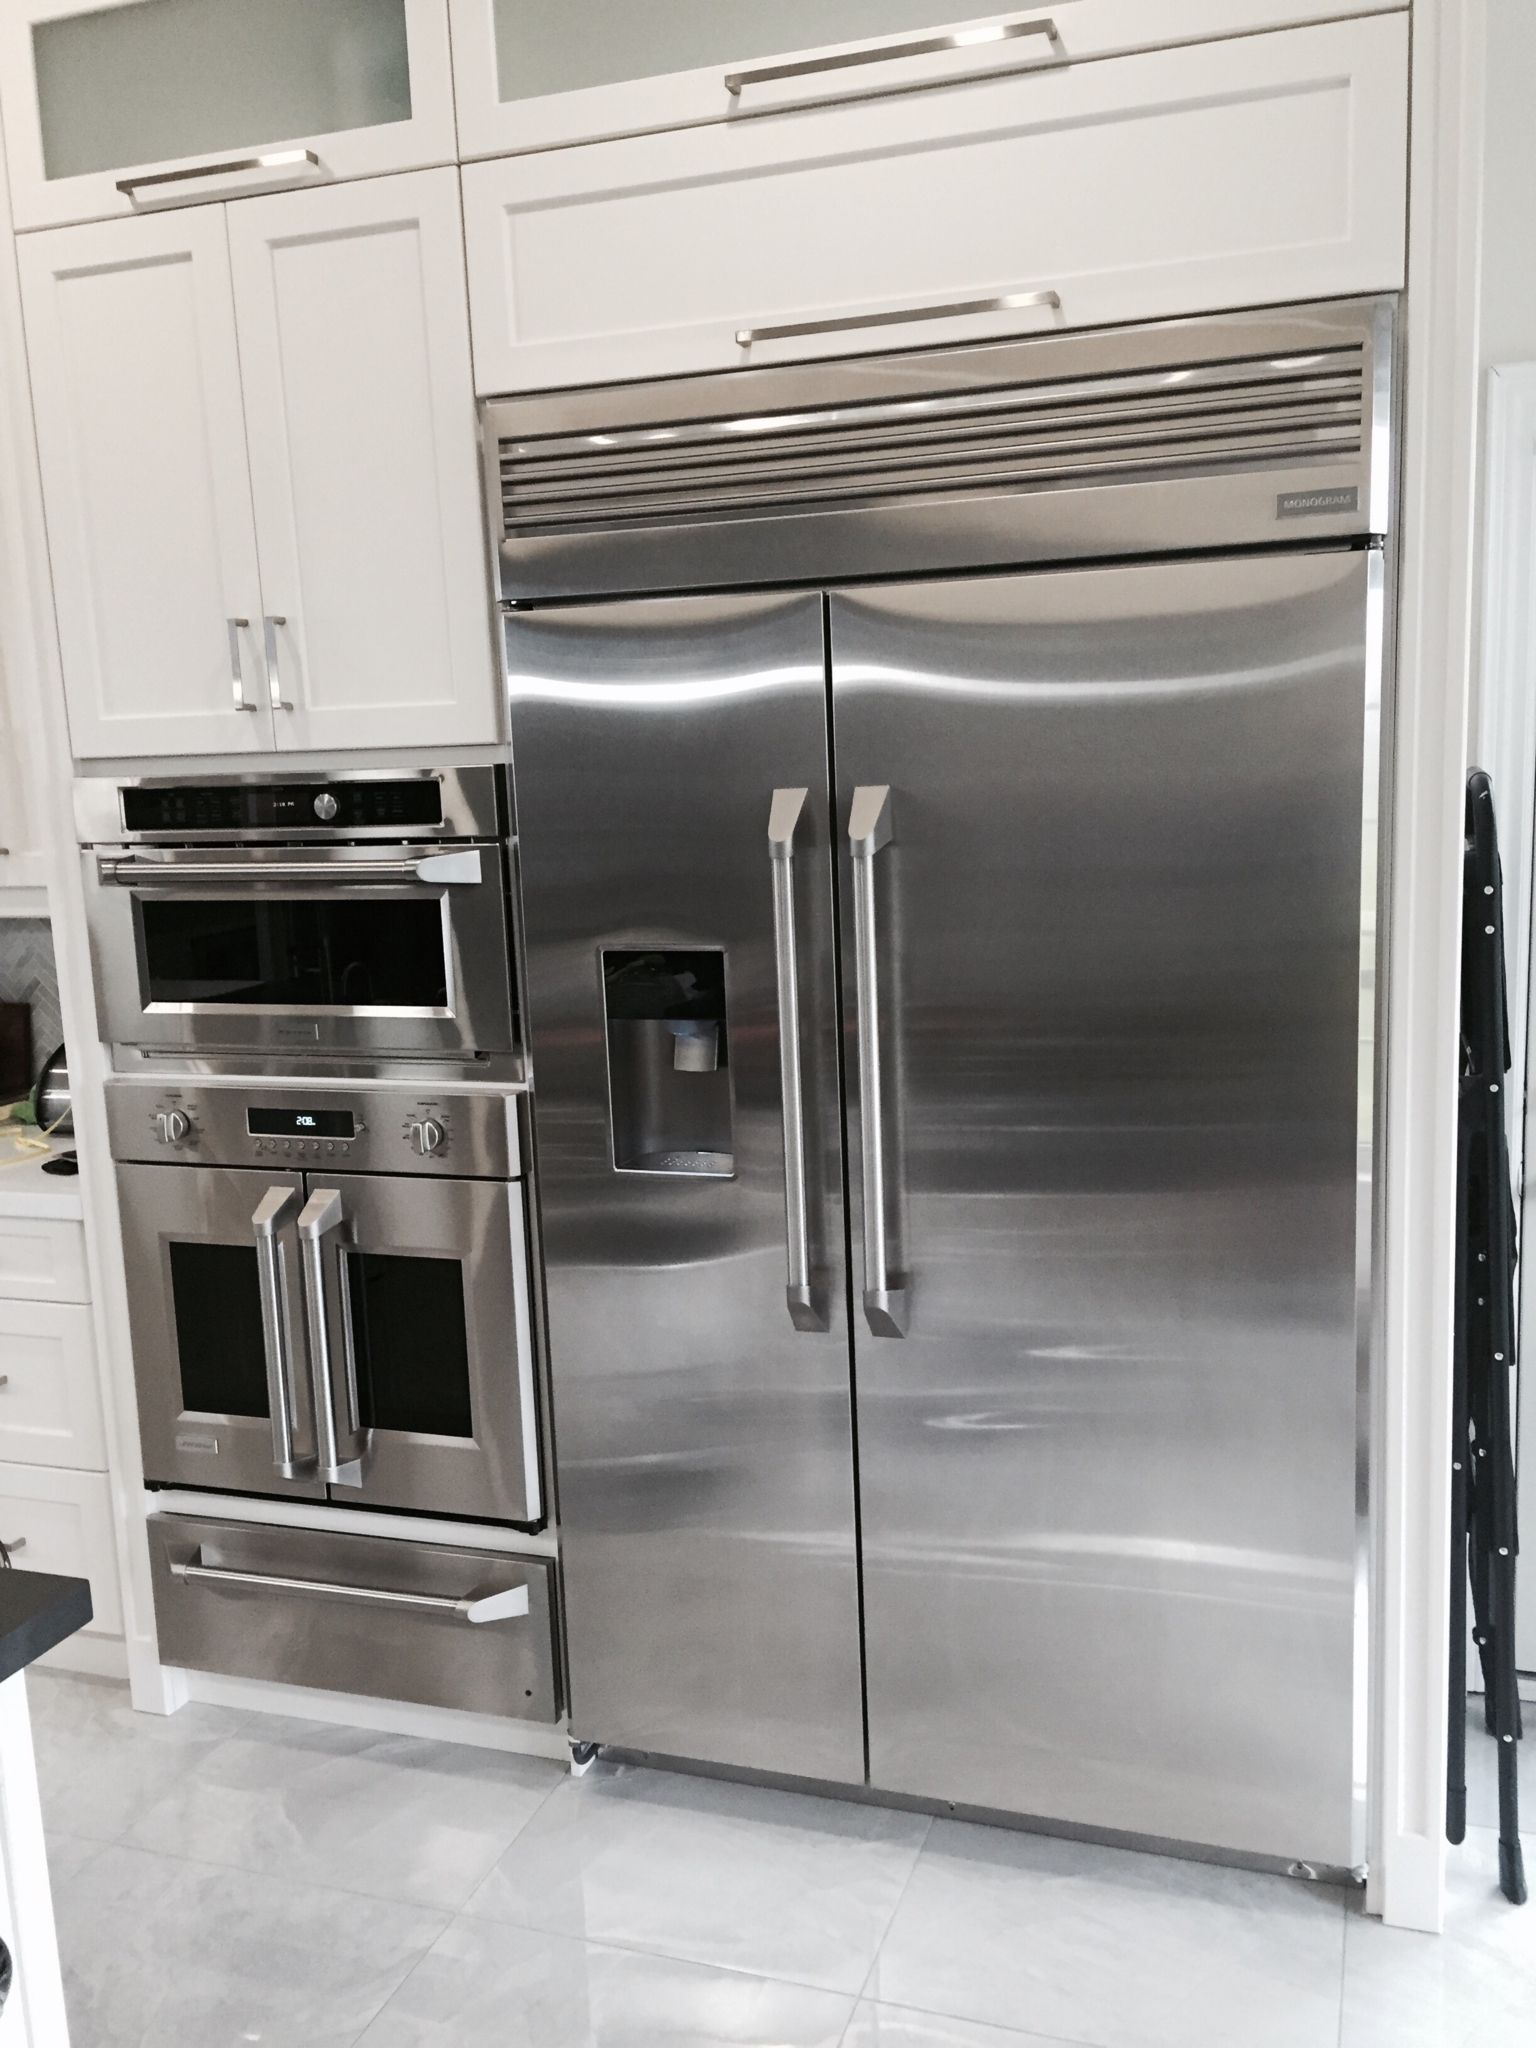 Gas Appliance Installation : Metro west gas appliance installation ltd opening